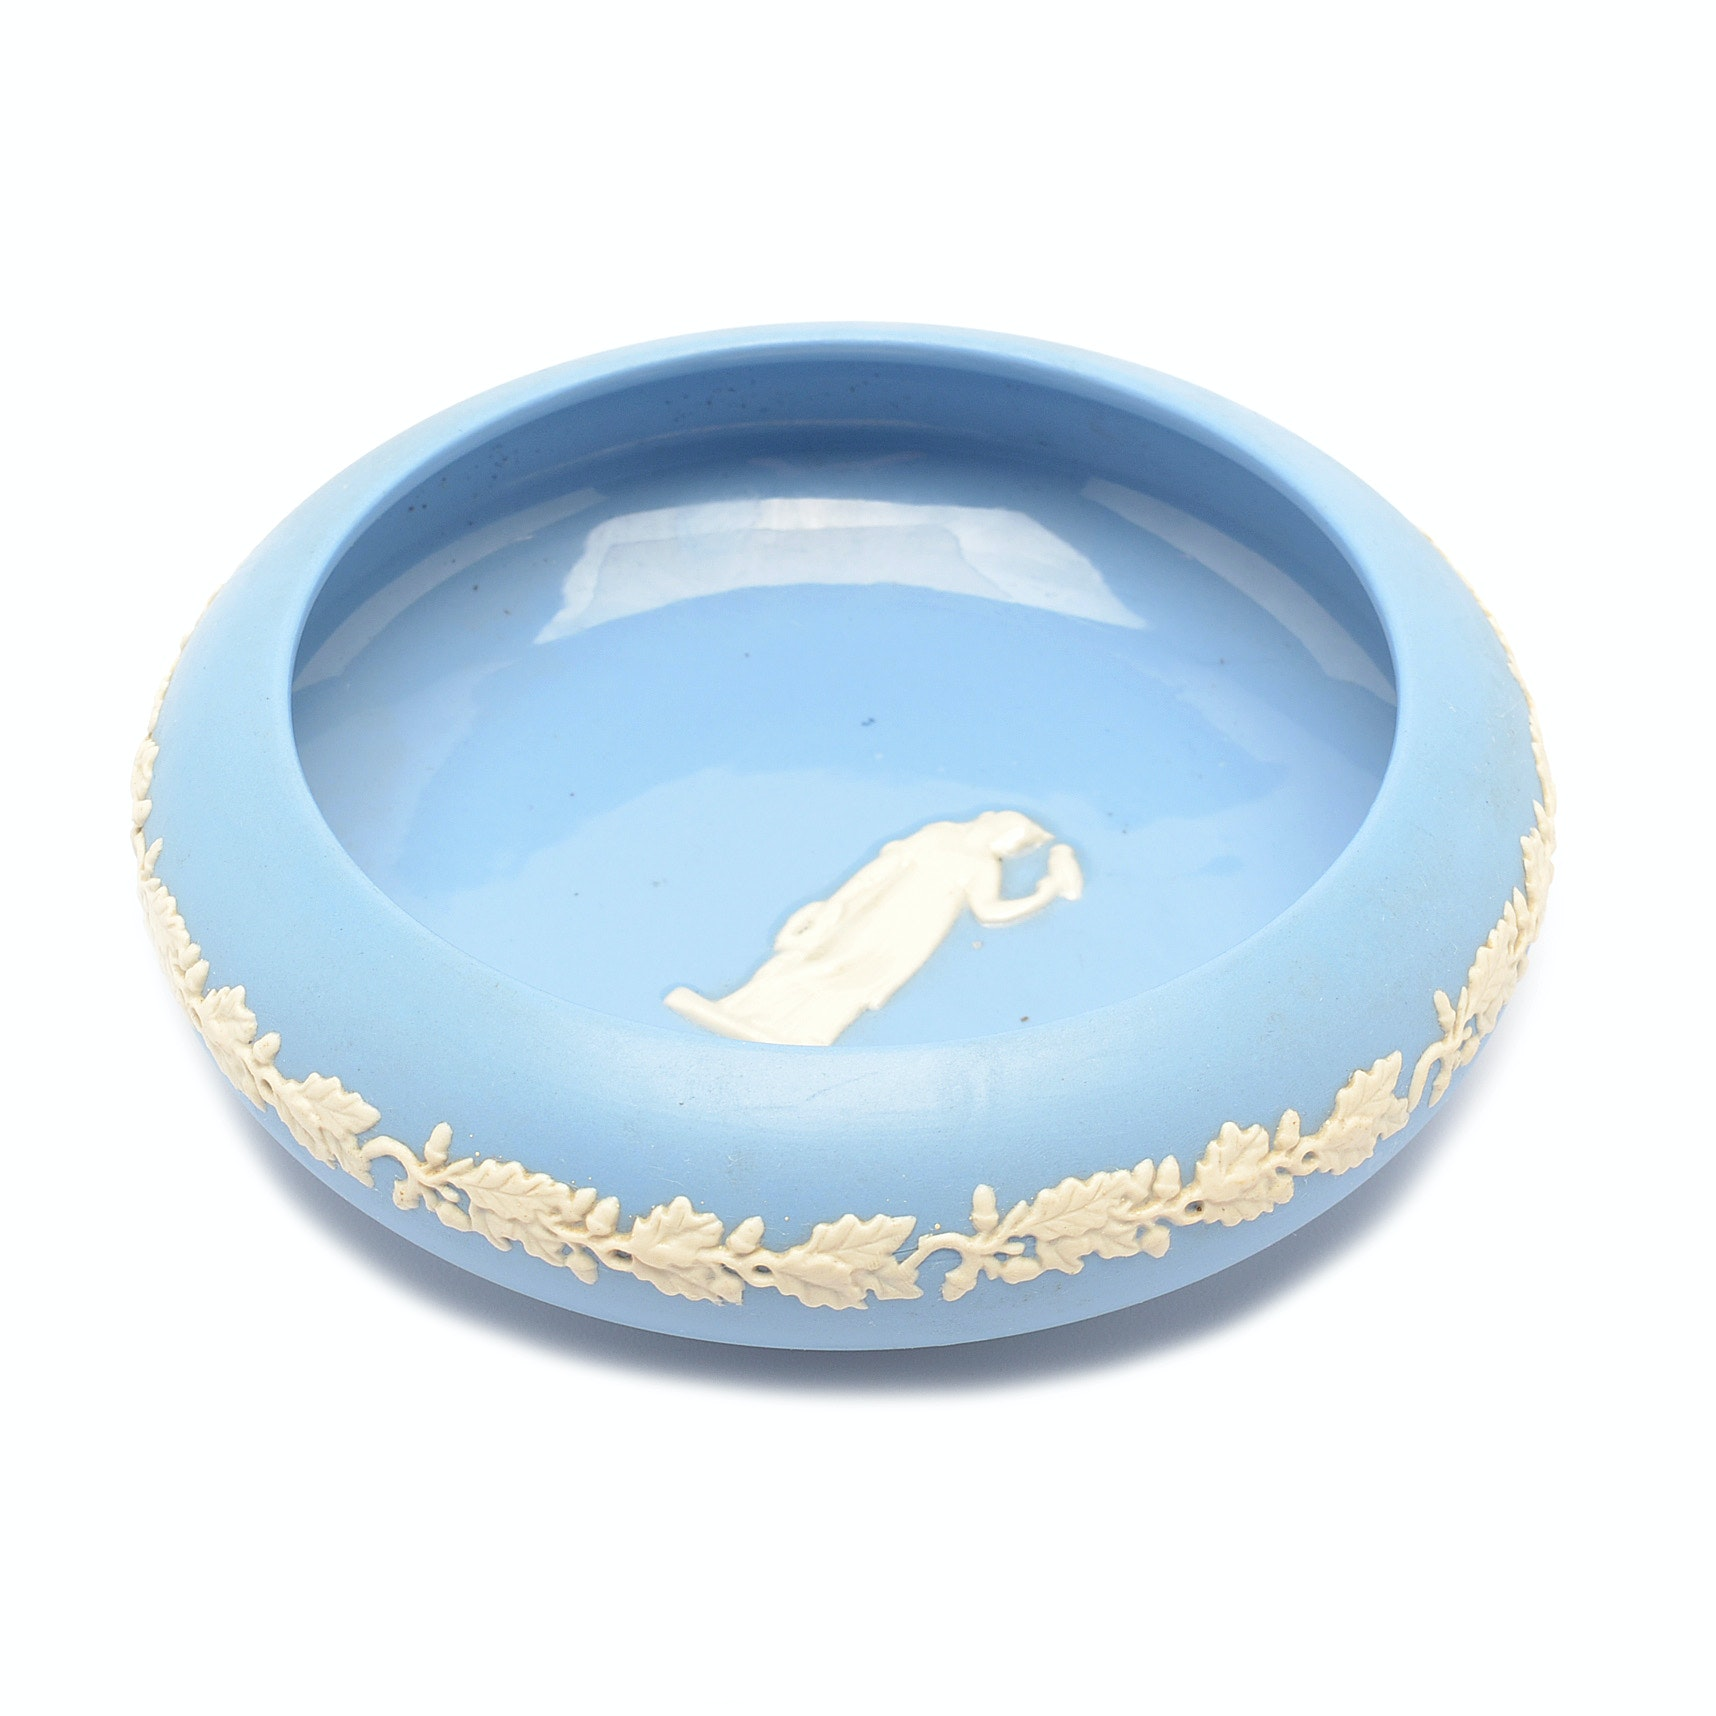 Dudson Hanley Jasperware Pottery Console Bowl